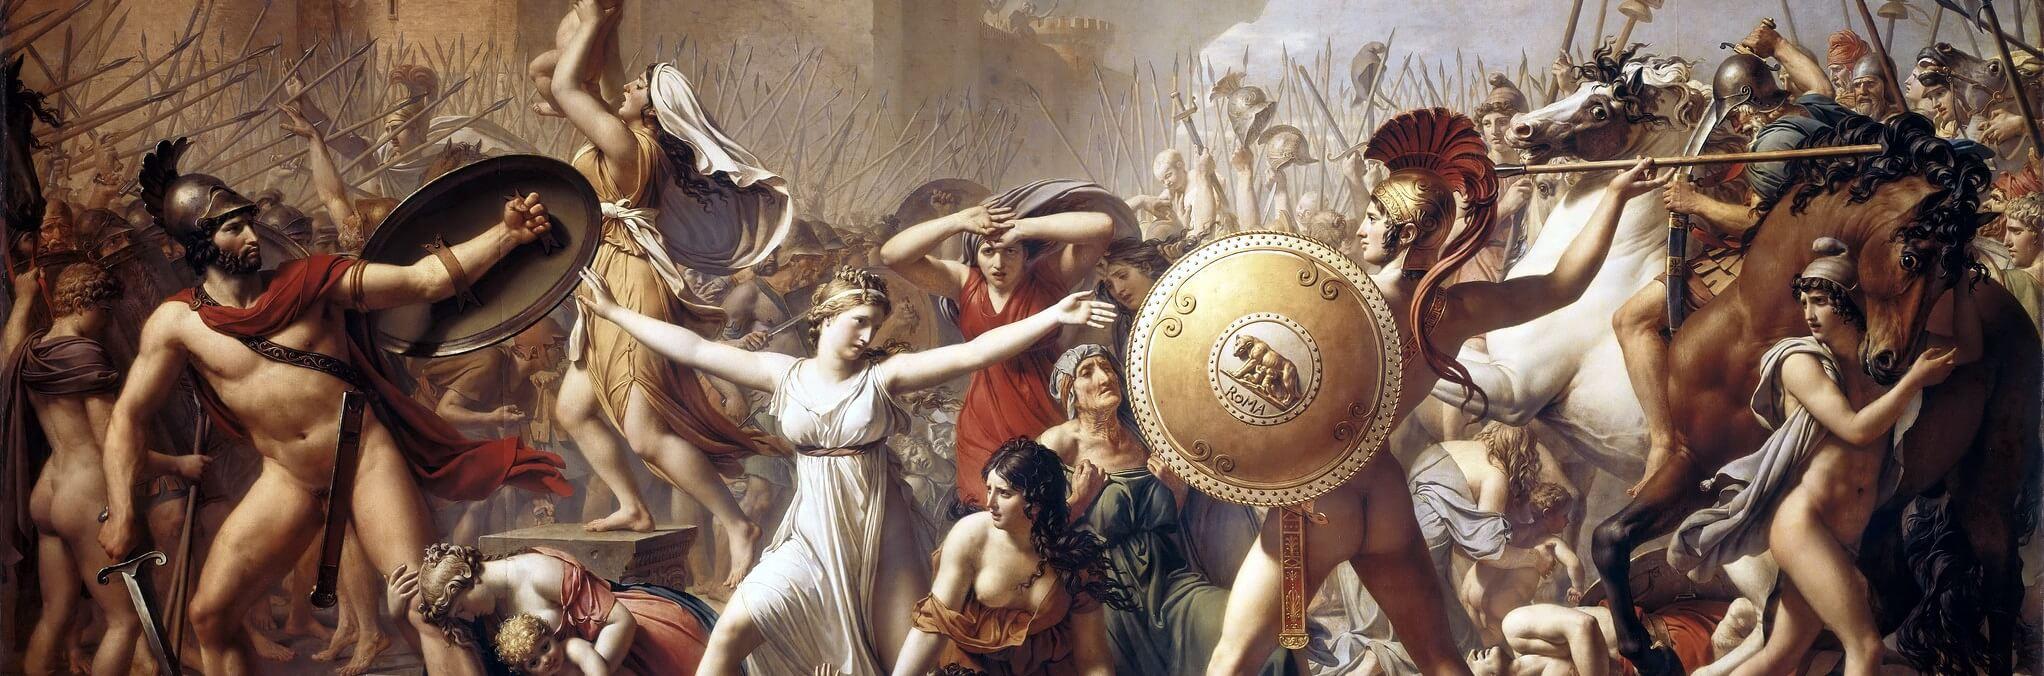 Artisti - Jacques-Louis David